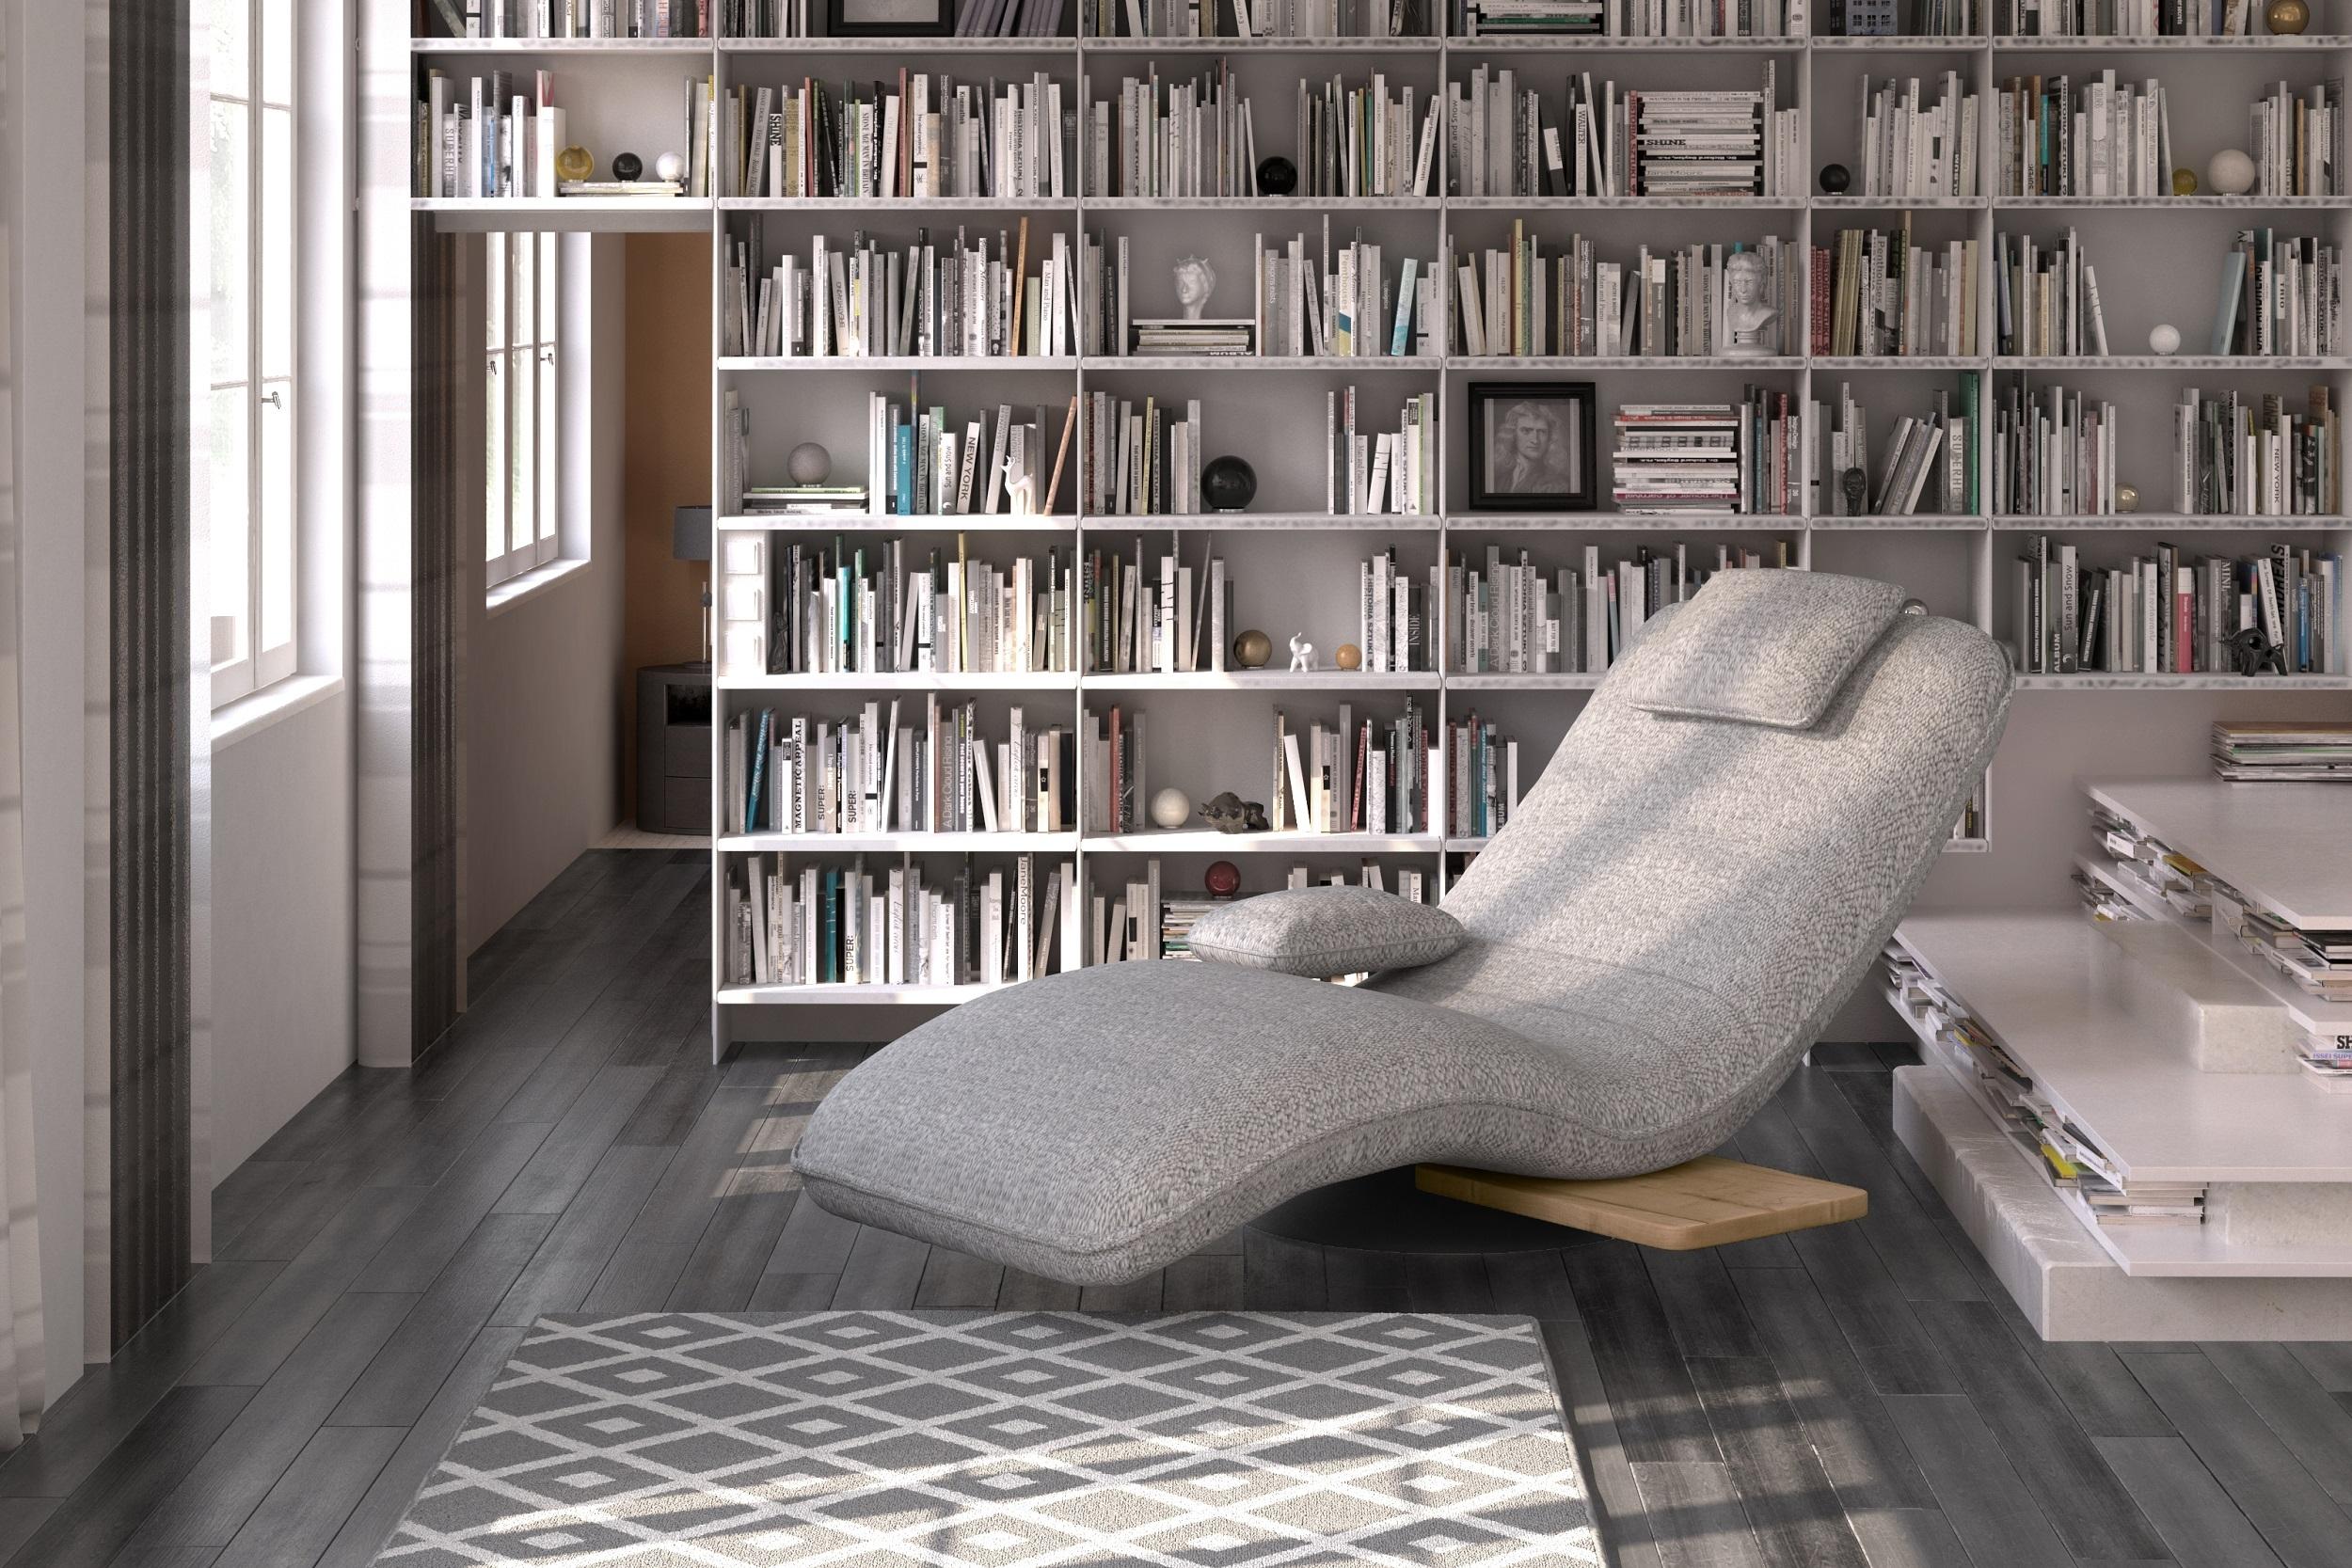 Fotoliu sezlong relaxare, tapitat cu stofa Evo Gri, l78xA163xH86 cm imagine